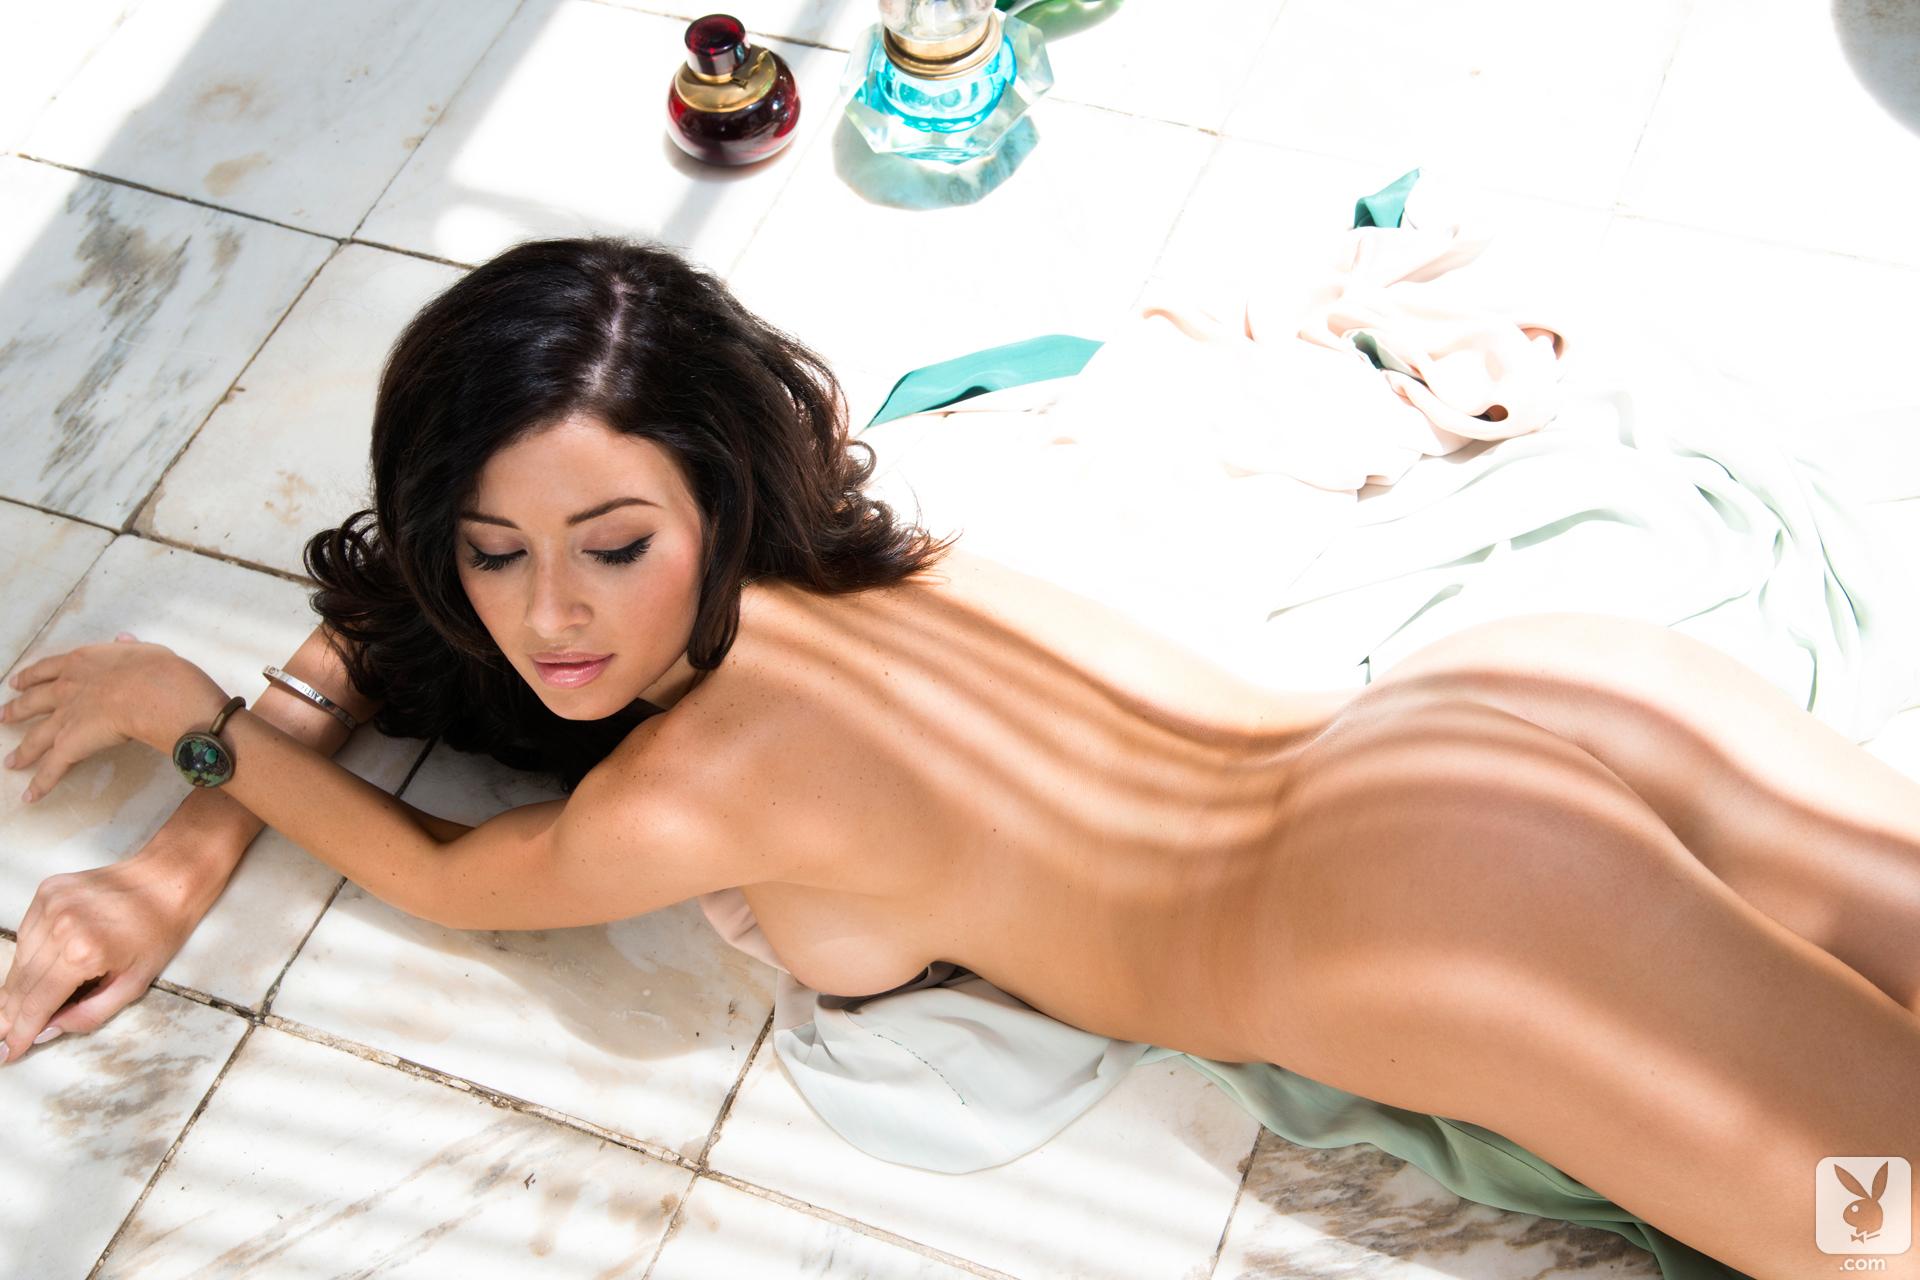 gemma-lee-farrell-brunette-nude-playboy-07